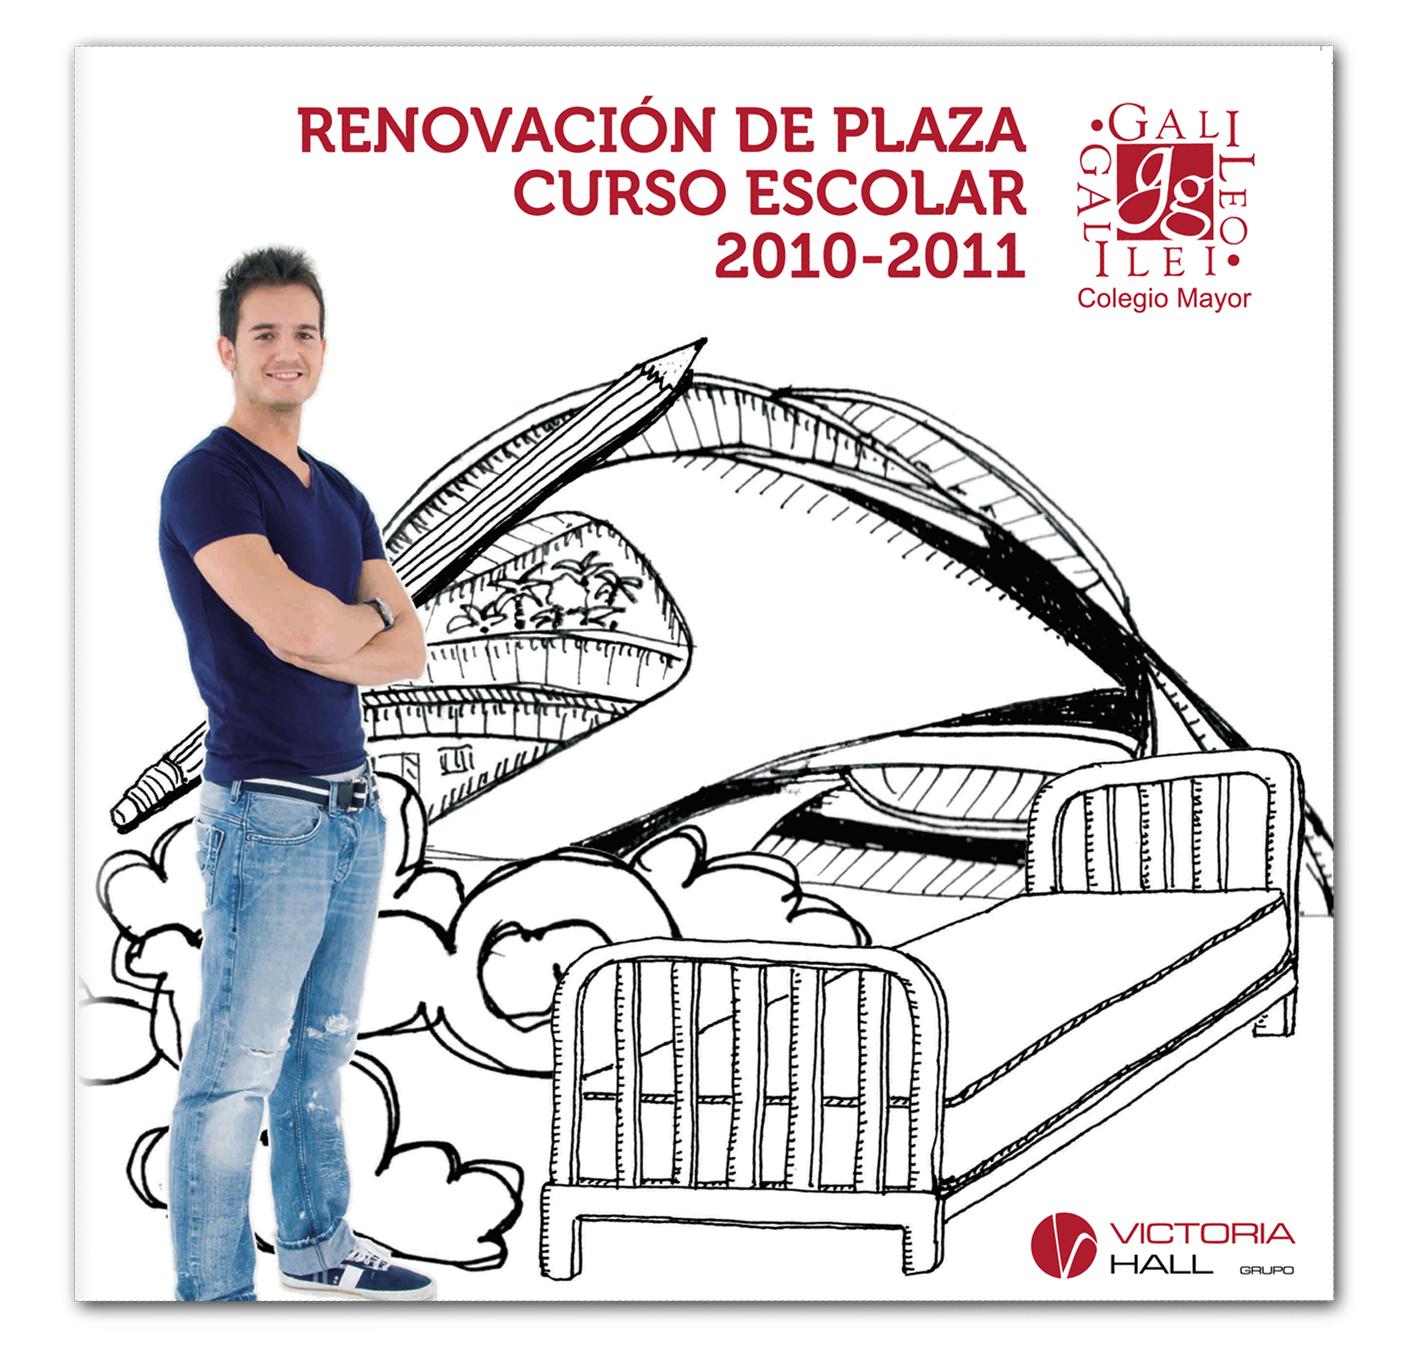 Tríptico Renovacion de plaza